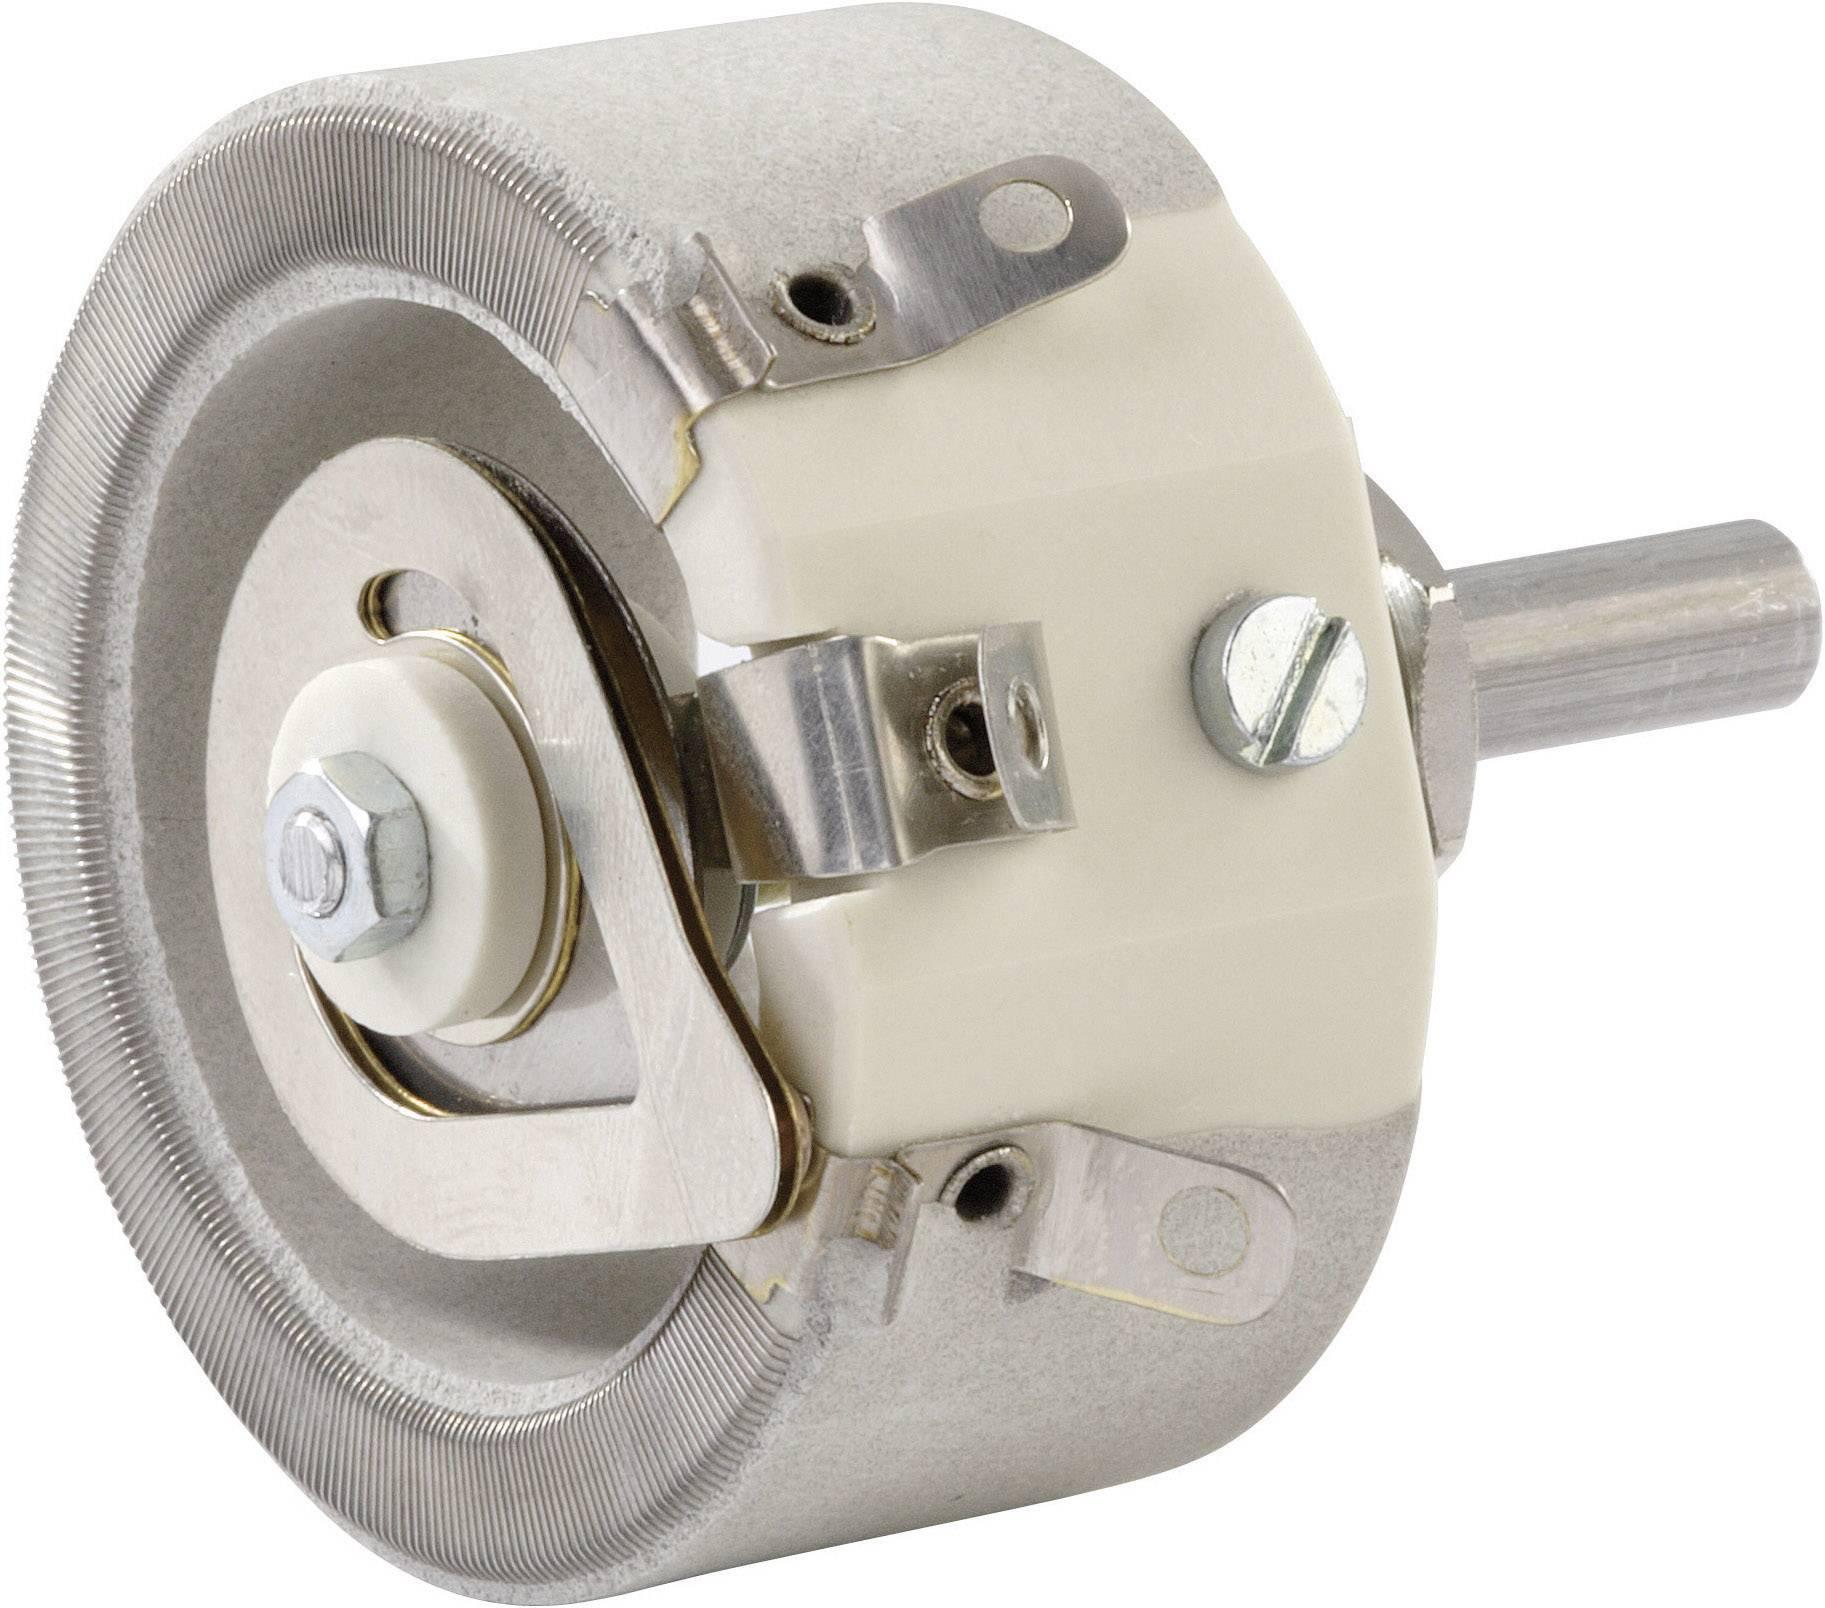 Drôtový potenciometer mono TT Electronics AB 3191106750 3191106750, 30 W, 220 Ohm, 1 ks